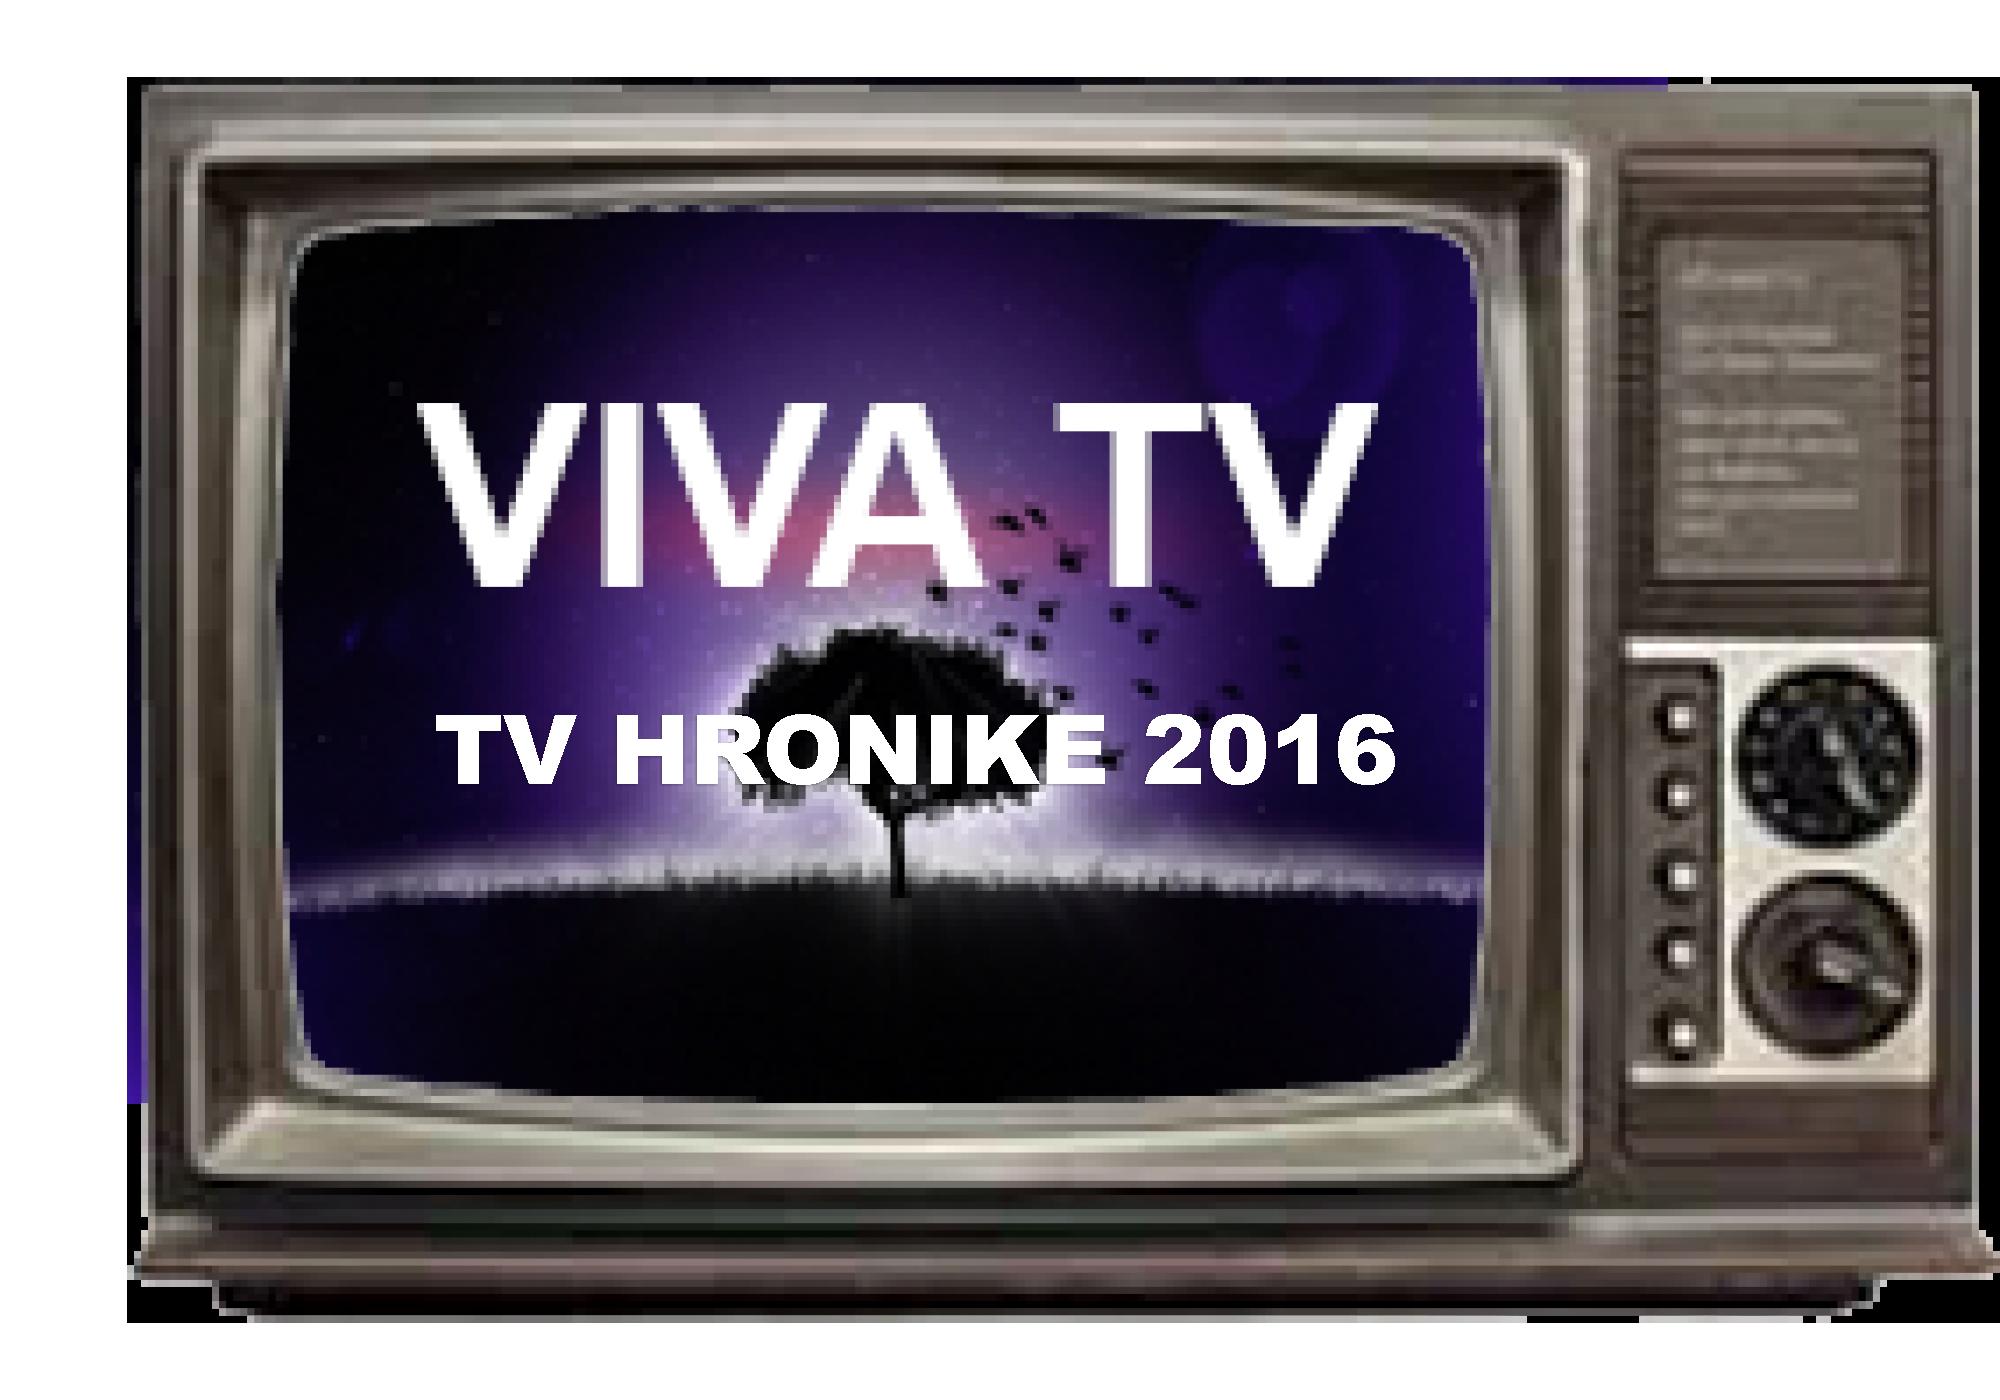 HRONIKE 2016